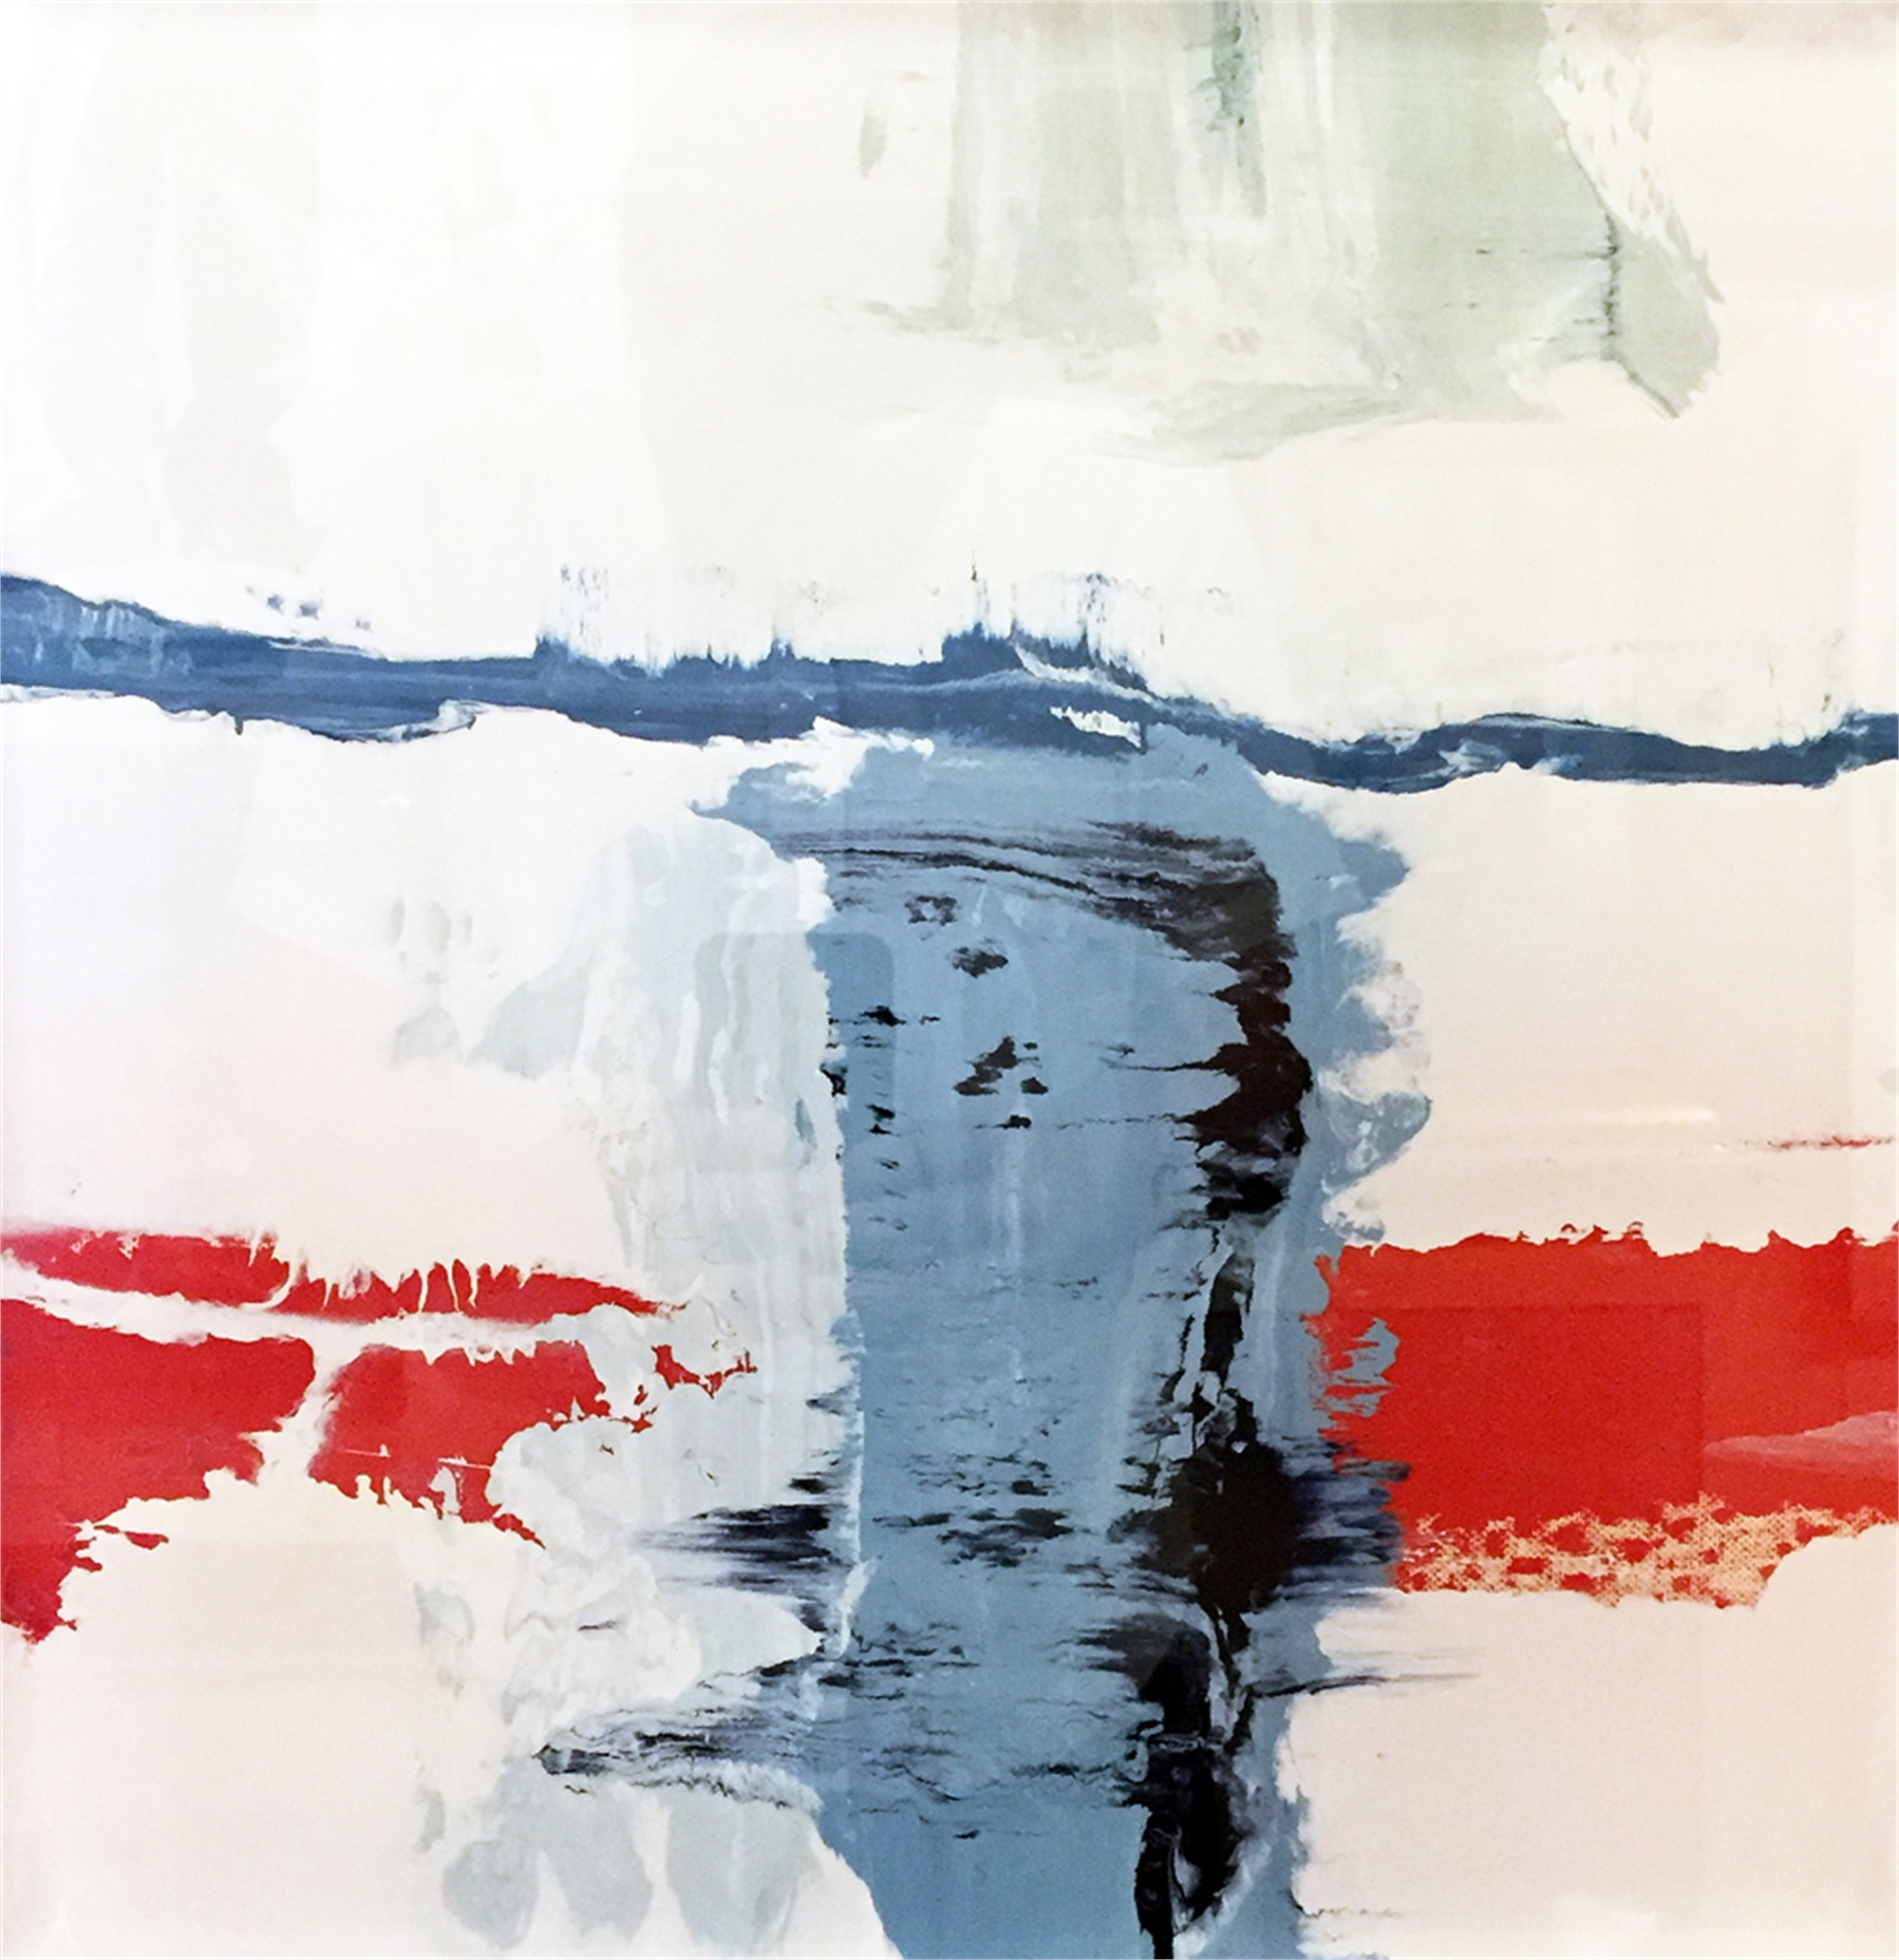 Vetro V by John Schuyler